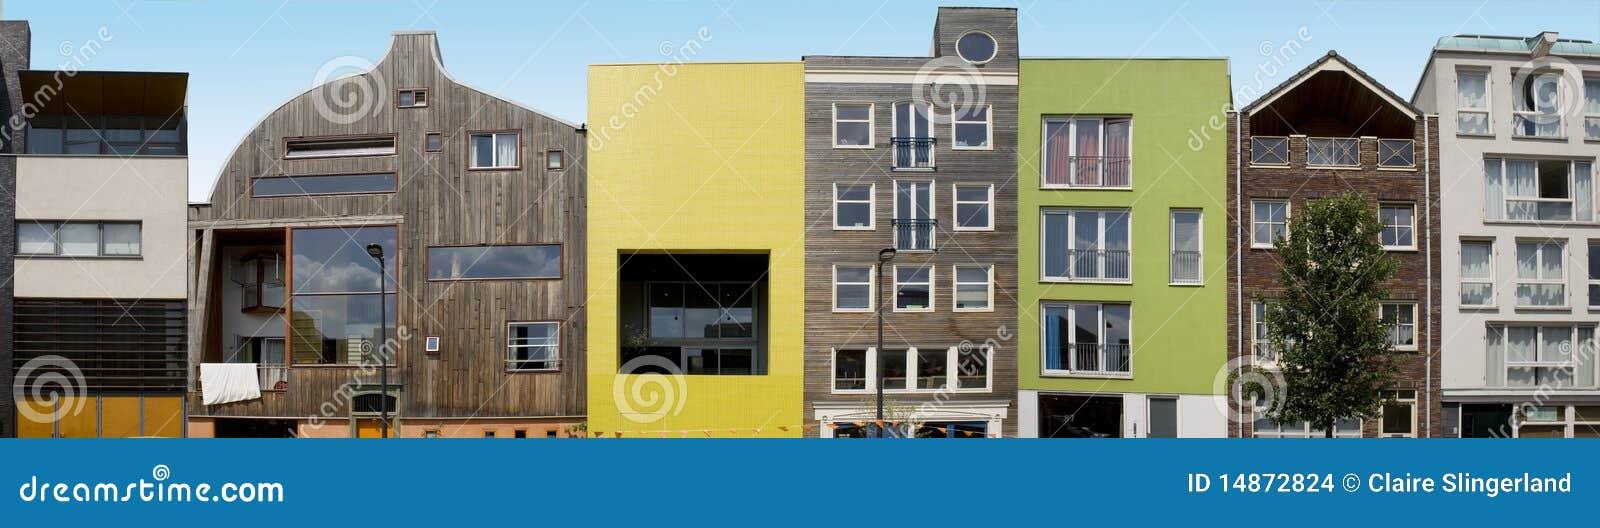 Architecture Moderne Sur Ijburg Amsterdam Photo Stock